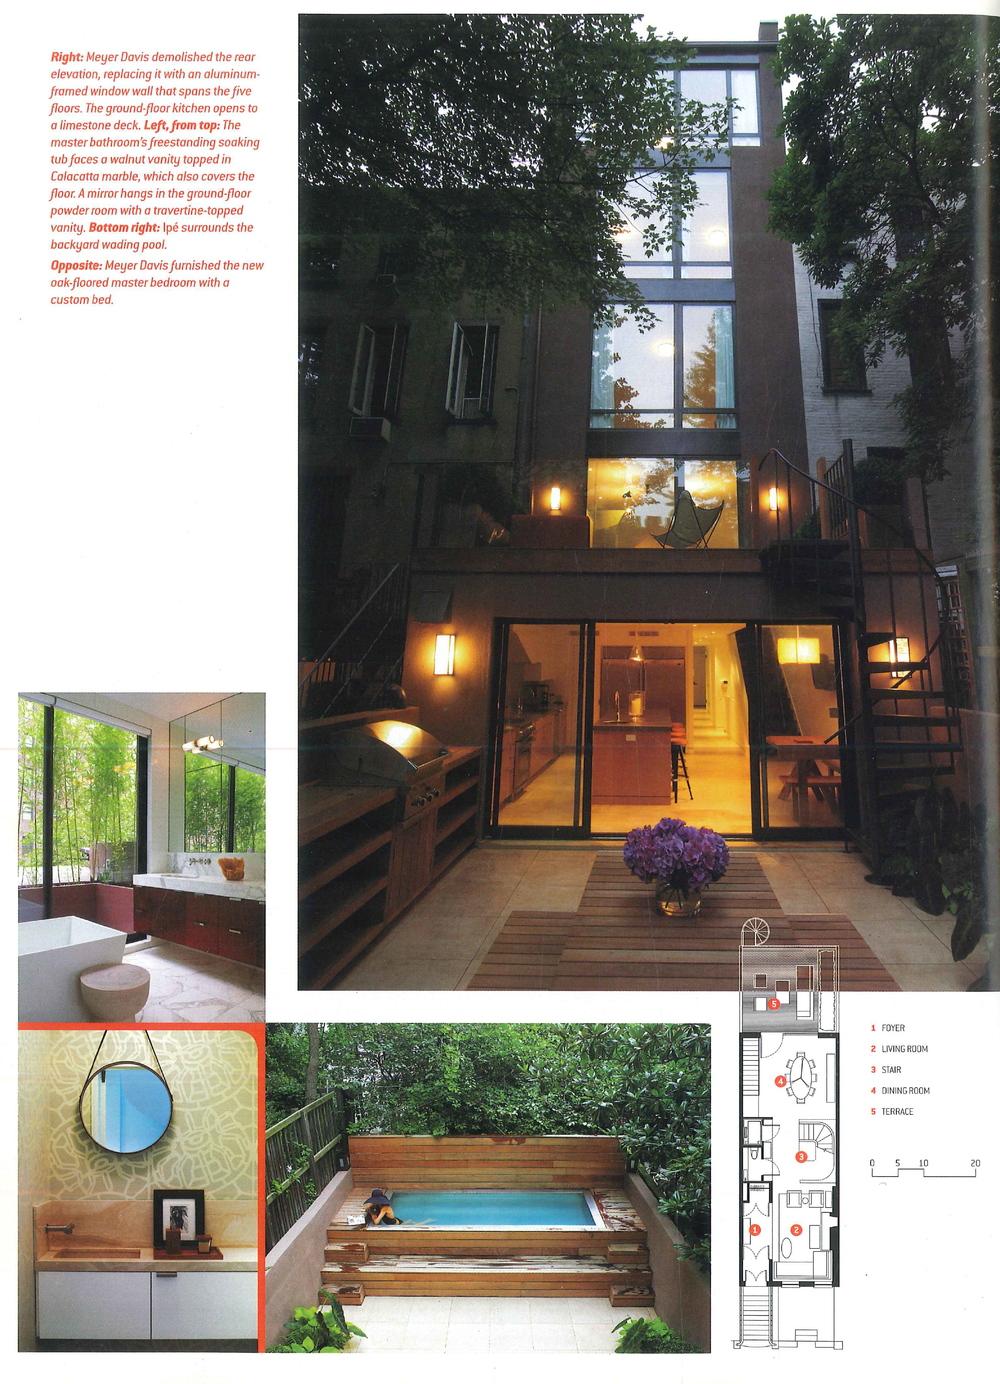 Interior Design Magazine_Nov 2008-7.jpg